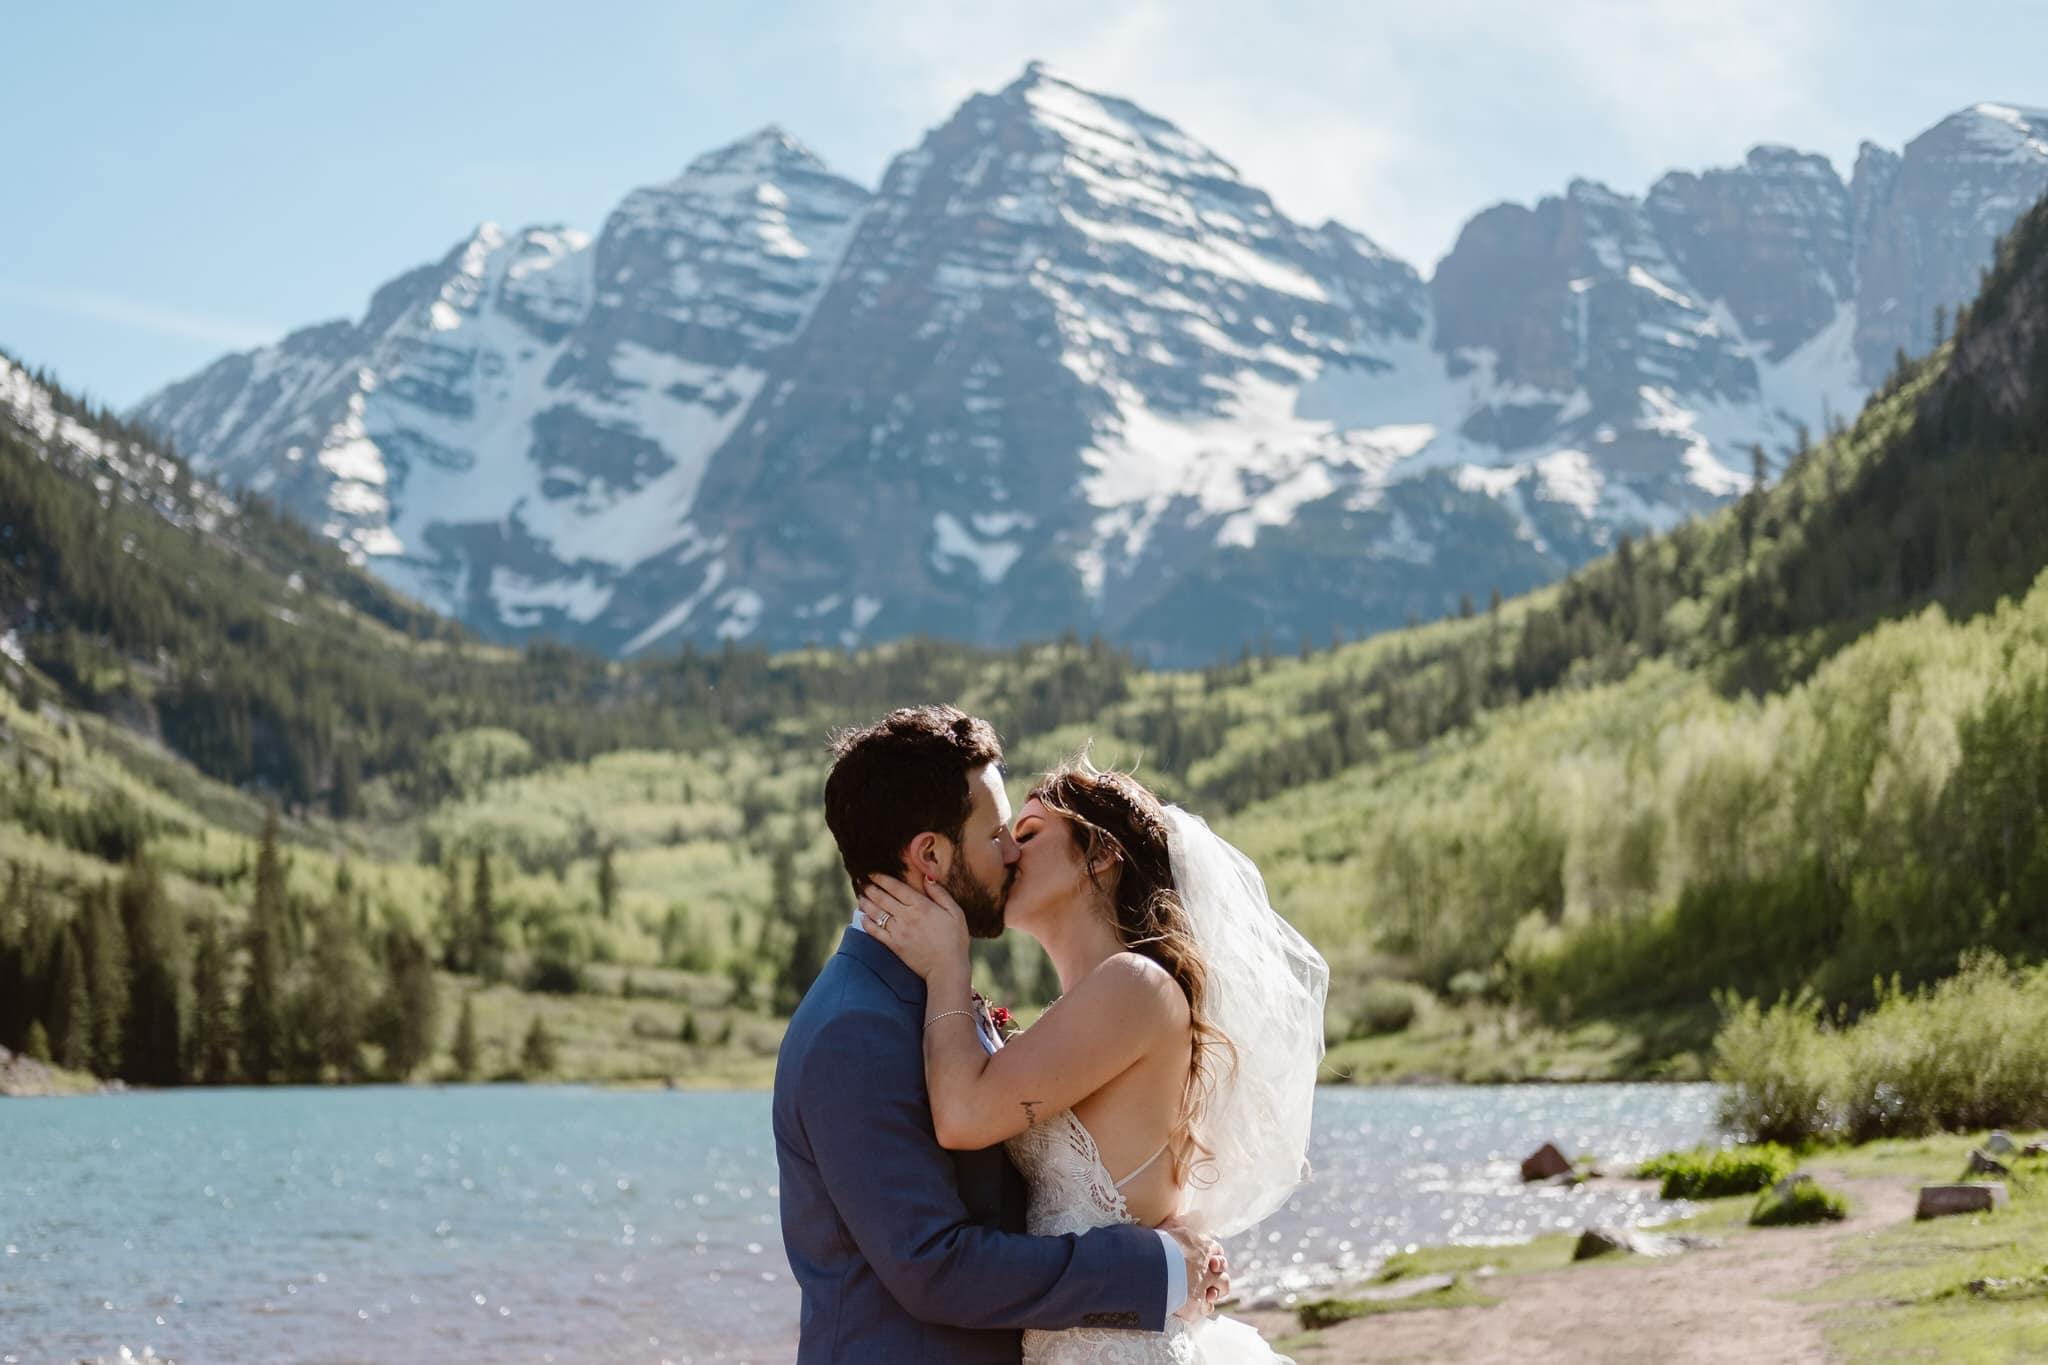 Wedding photos at Maroon Bells Amphitiheater in Aspen